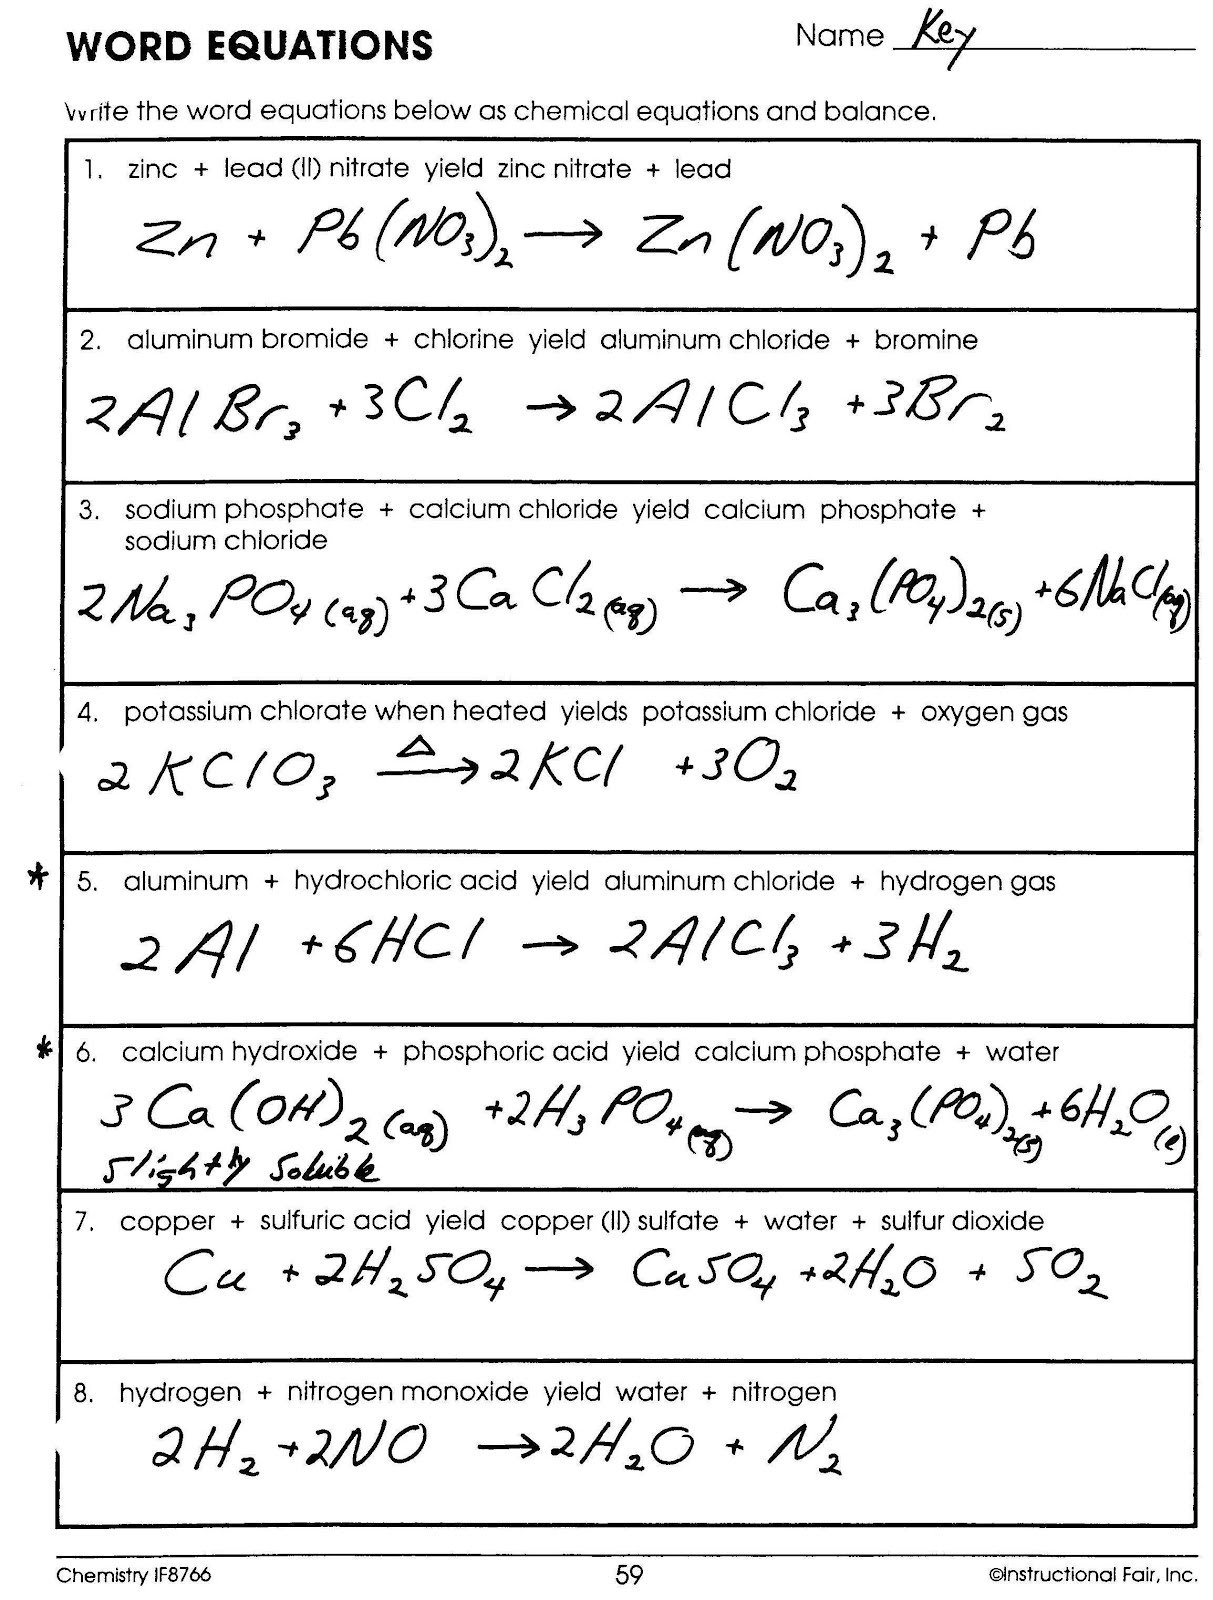 Printables  Chemistry Word Equations Worksheet  Kigose Thousands